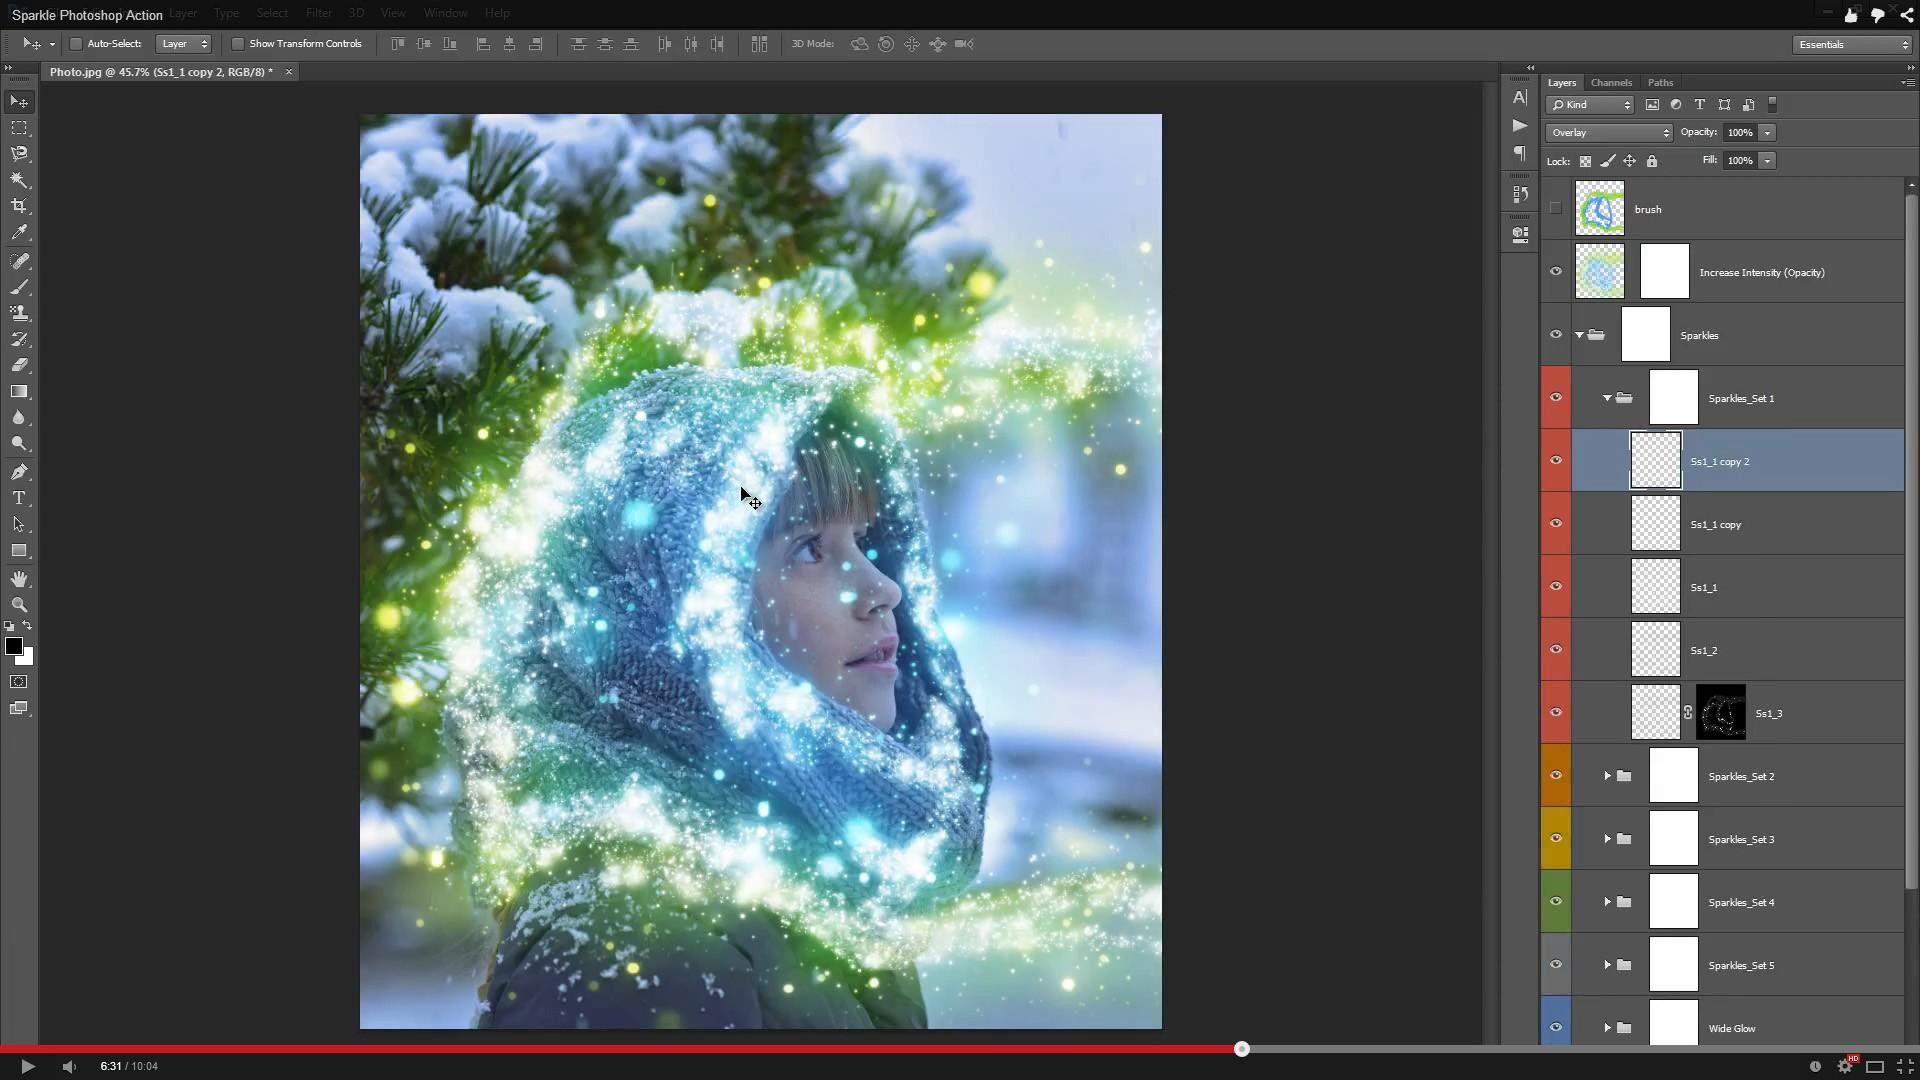 Adobe Photoshop CC 2018 With LifeTime Patch [ Latest ]